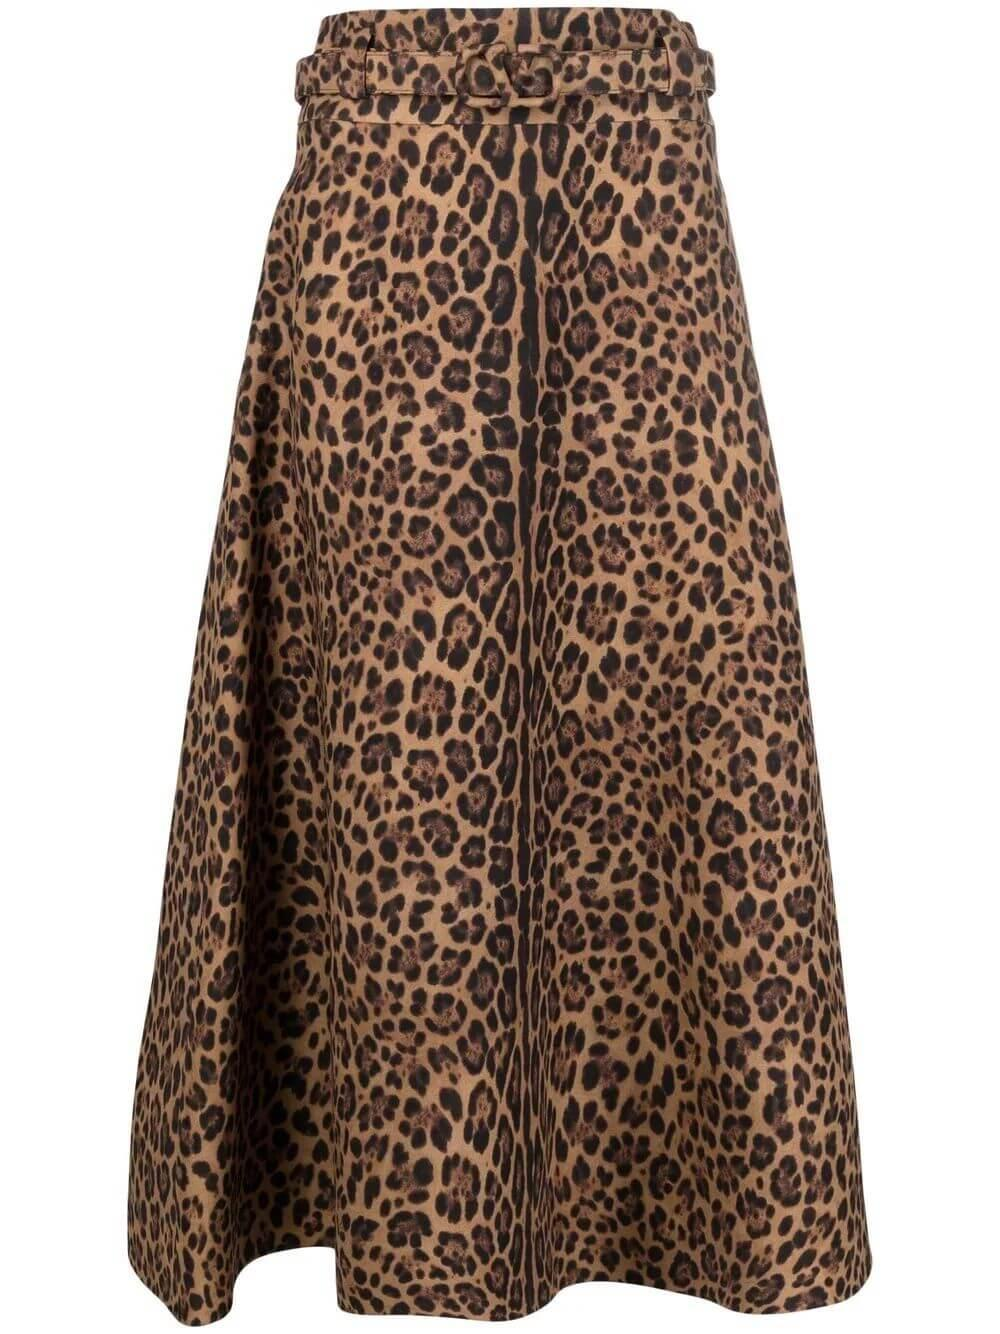 Leopard Print Midi Skirt Item # WB3RA8306NA